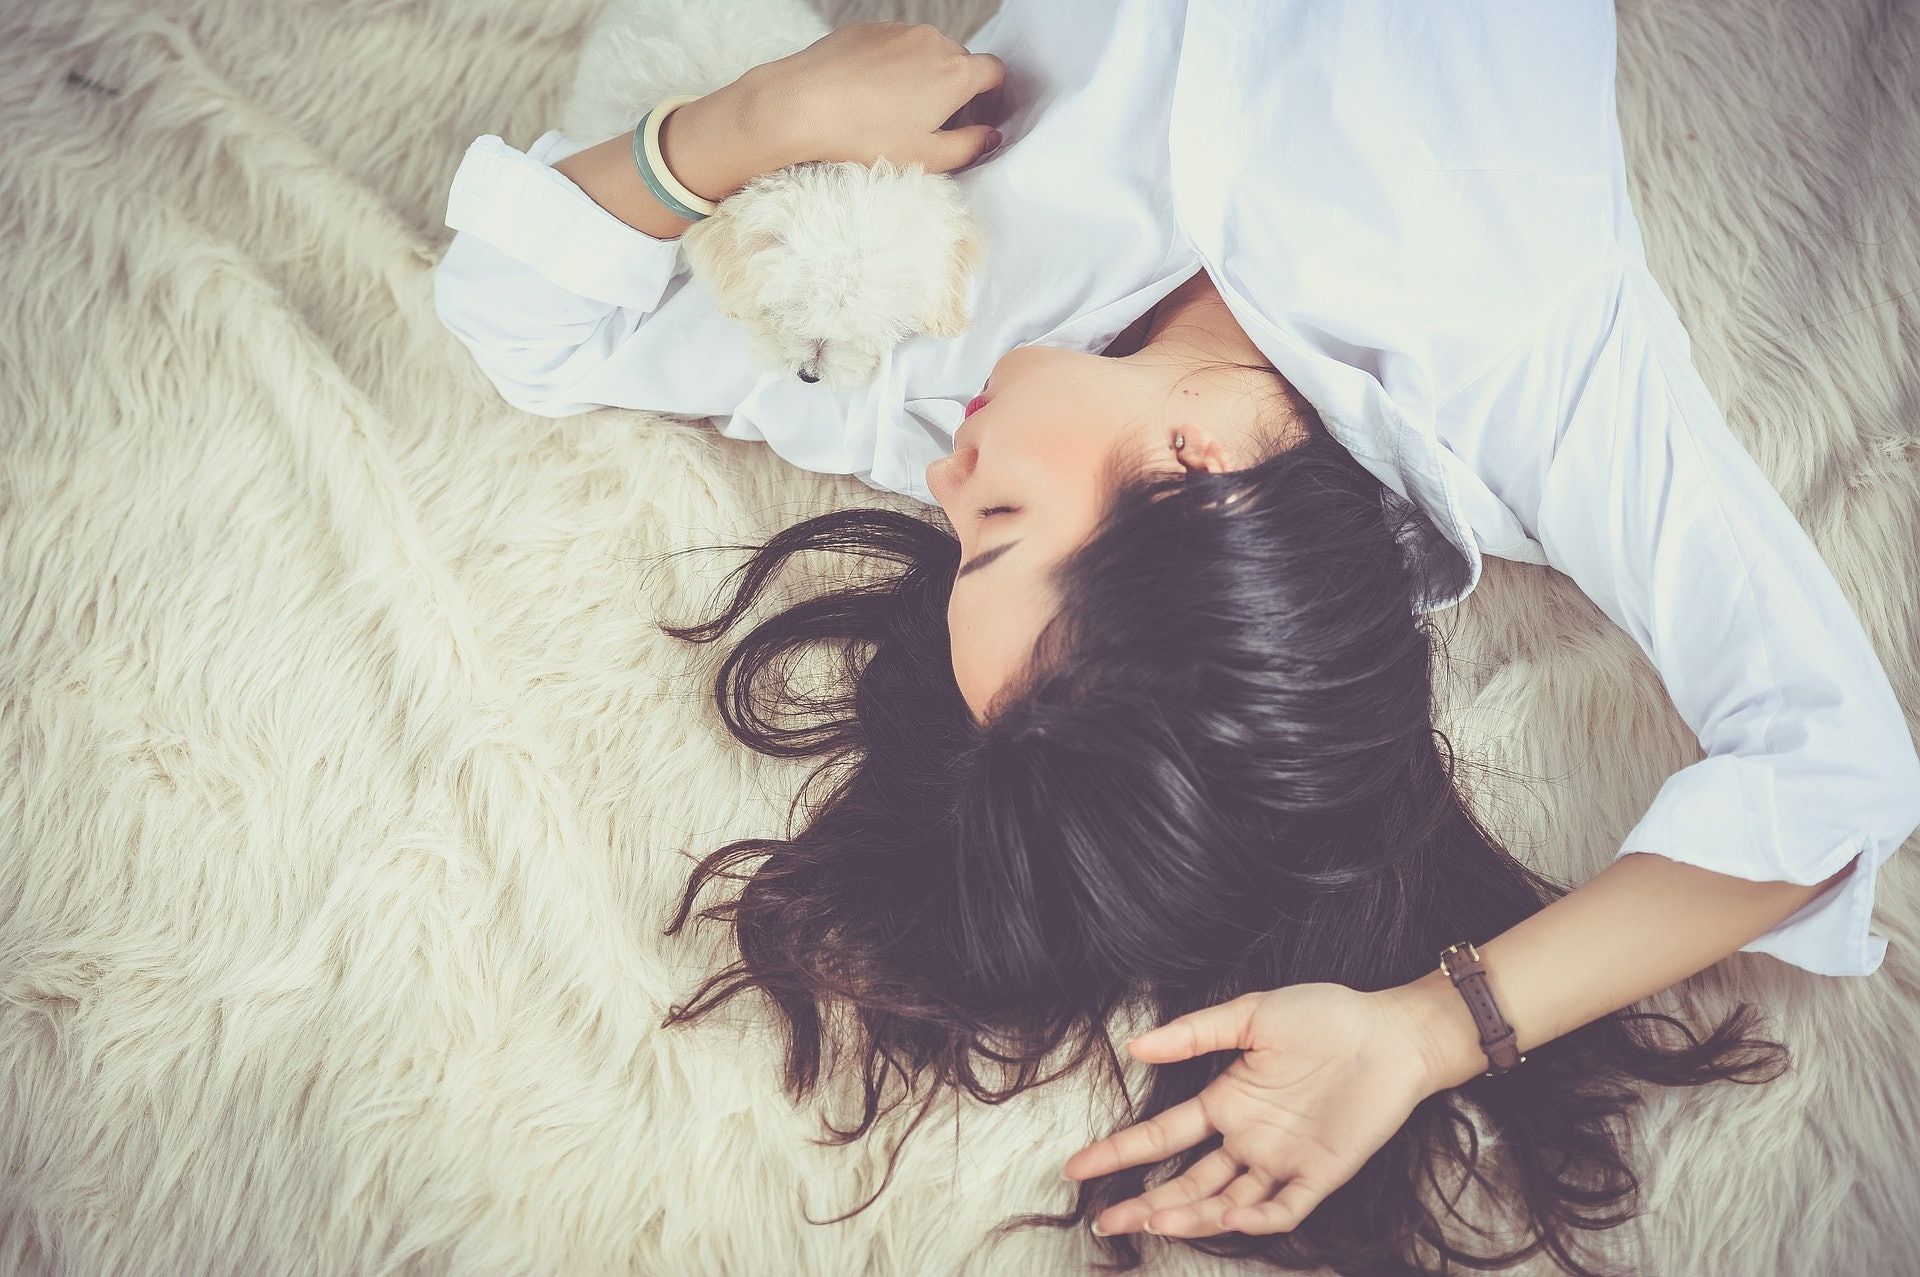 Penetration with endometriosis